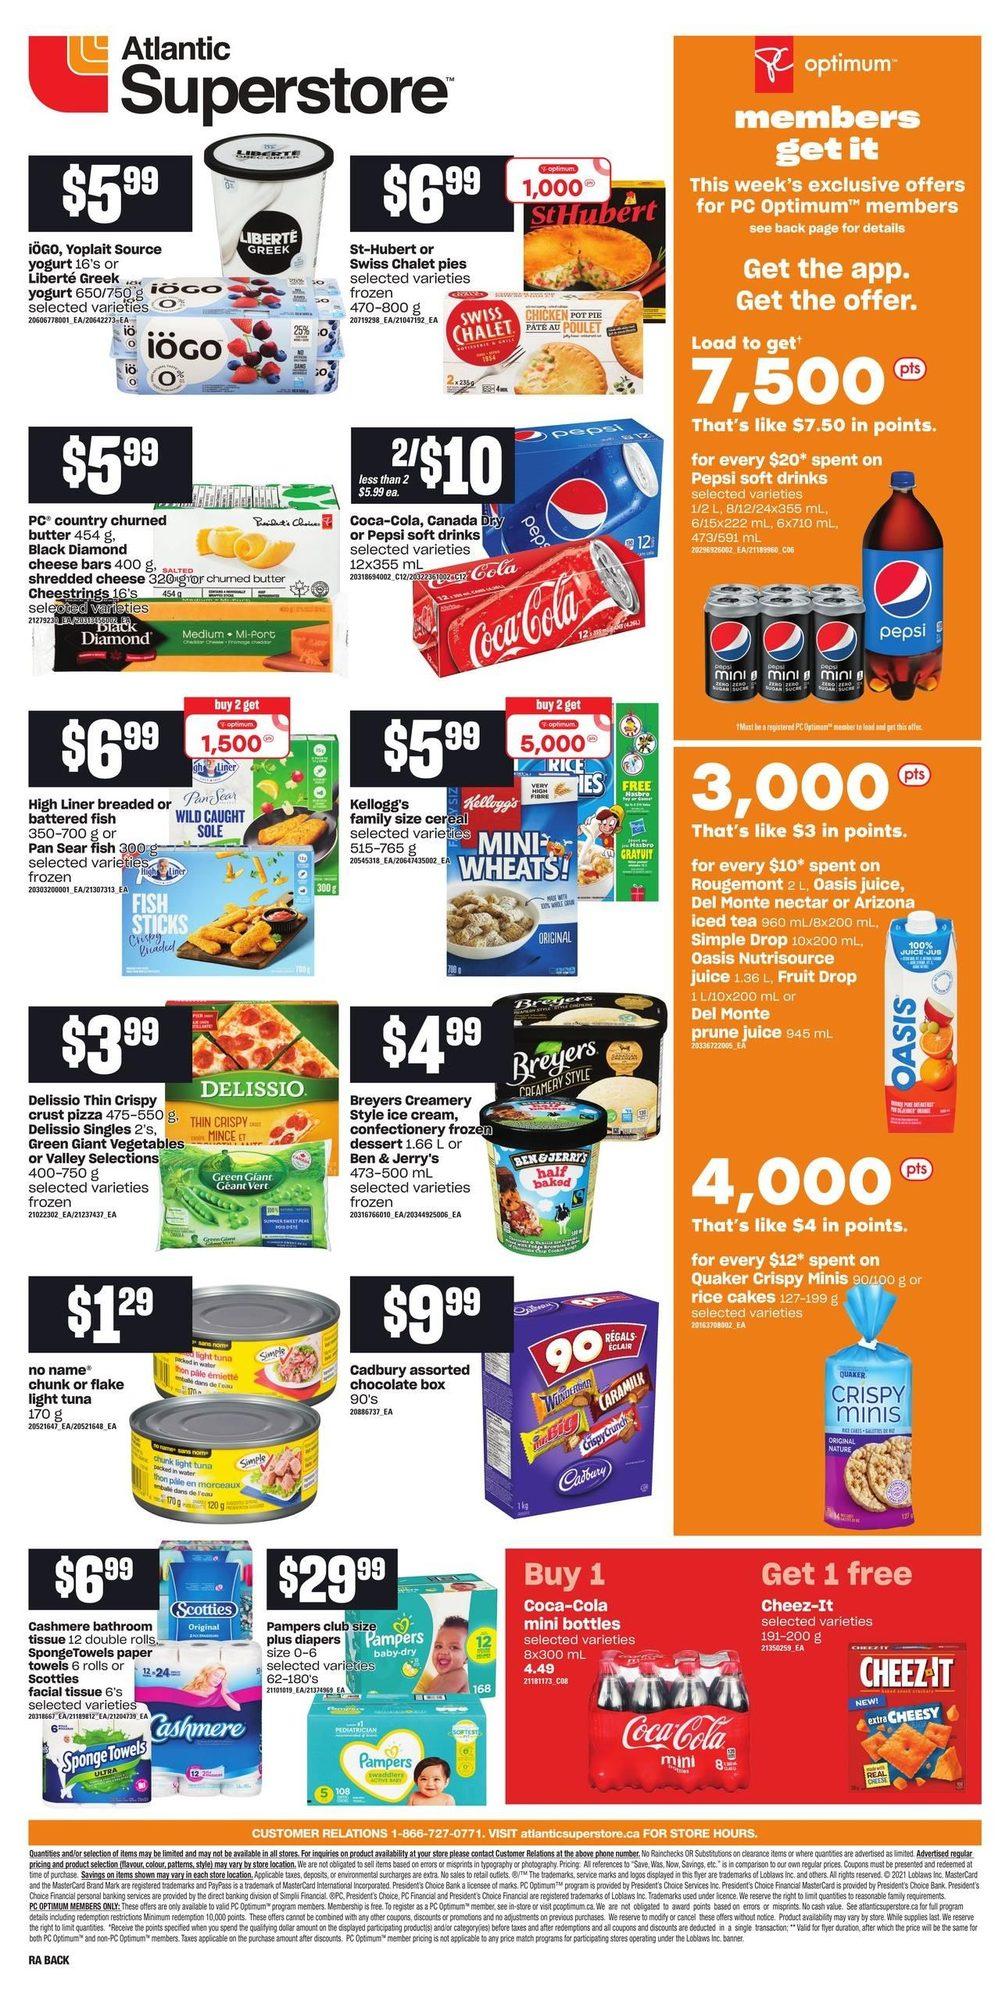 Atlantic Superstore - Weekly Flyer Specials - Page 2